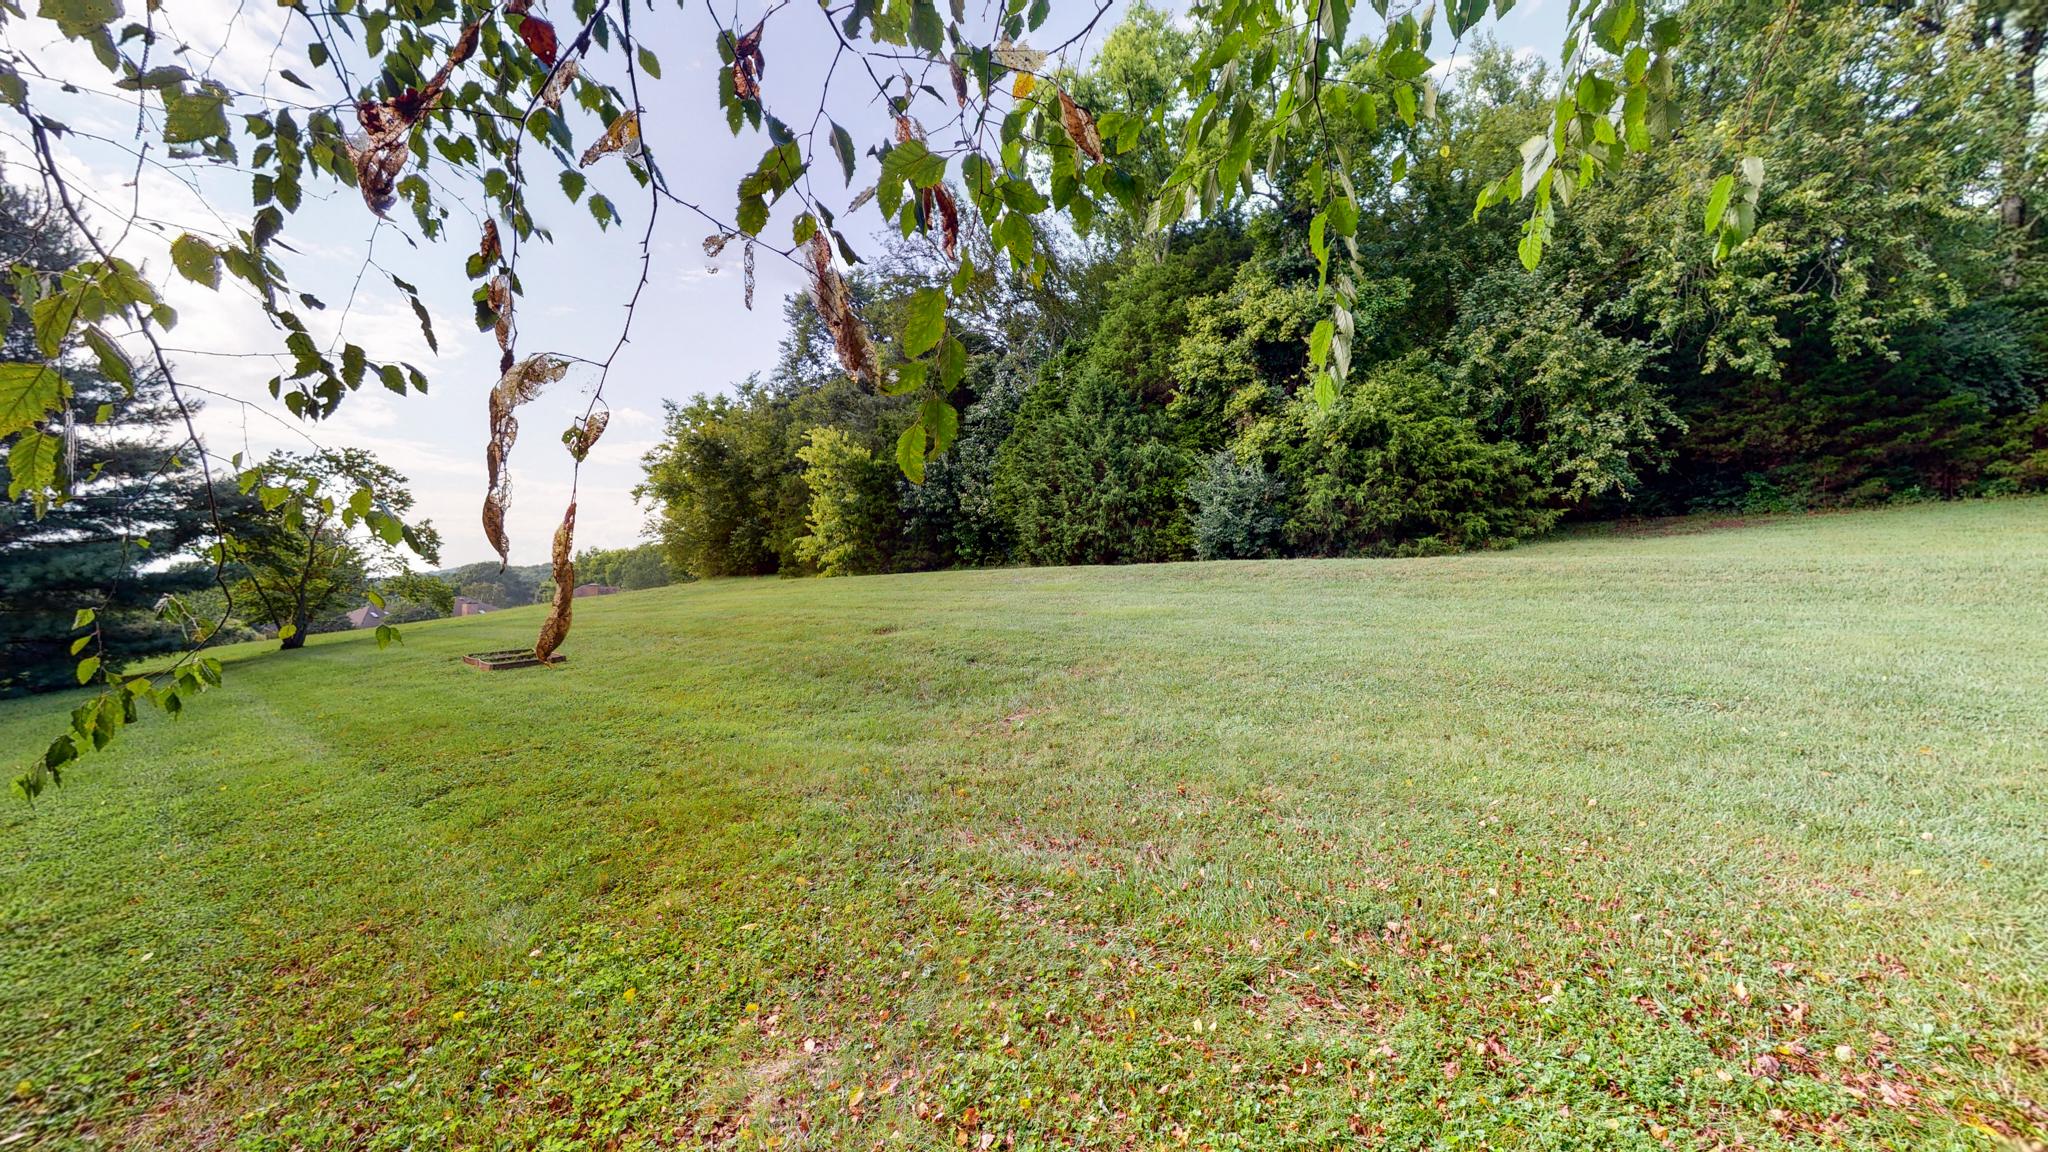 1620 Callie Way Drive - Franklin, TN Real Estate